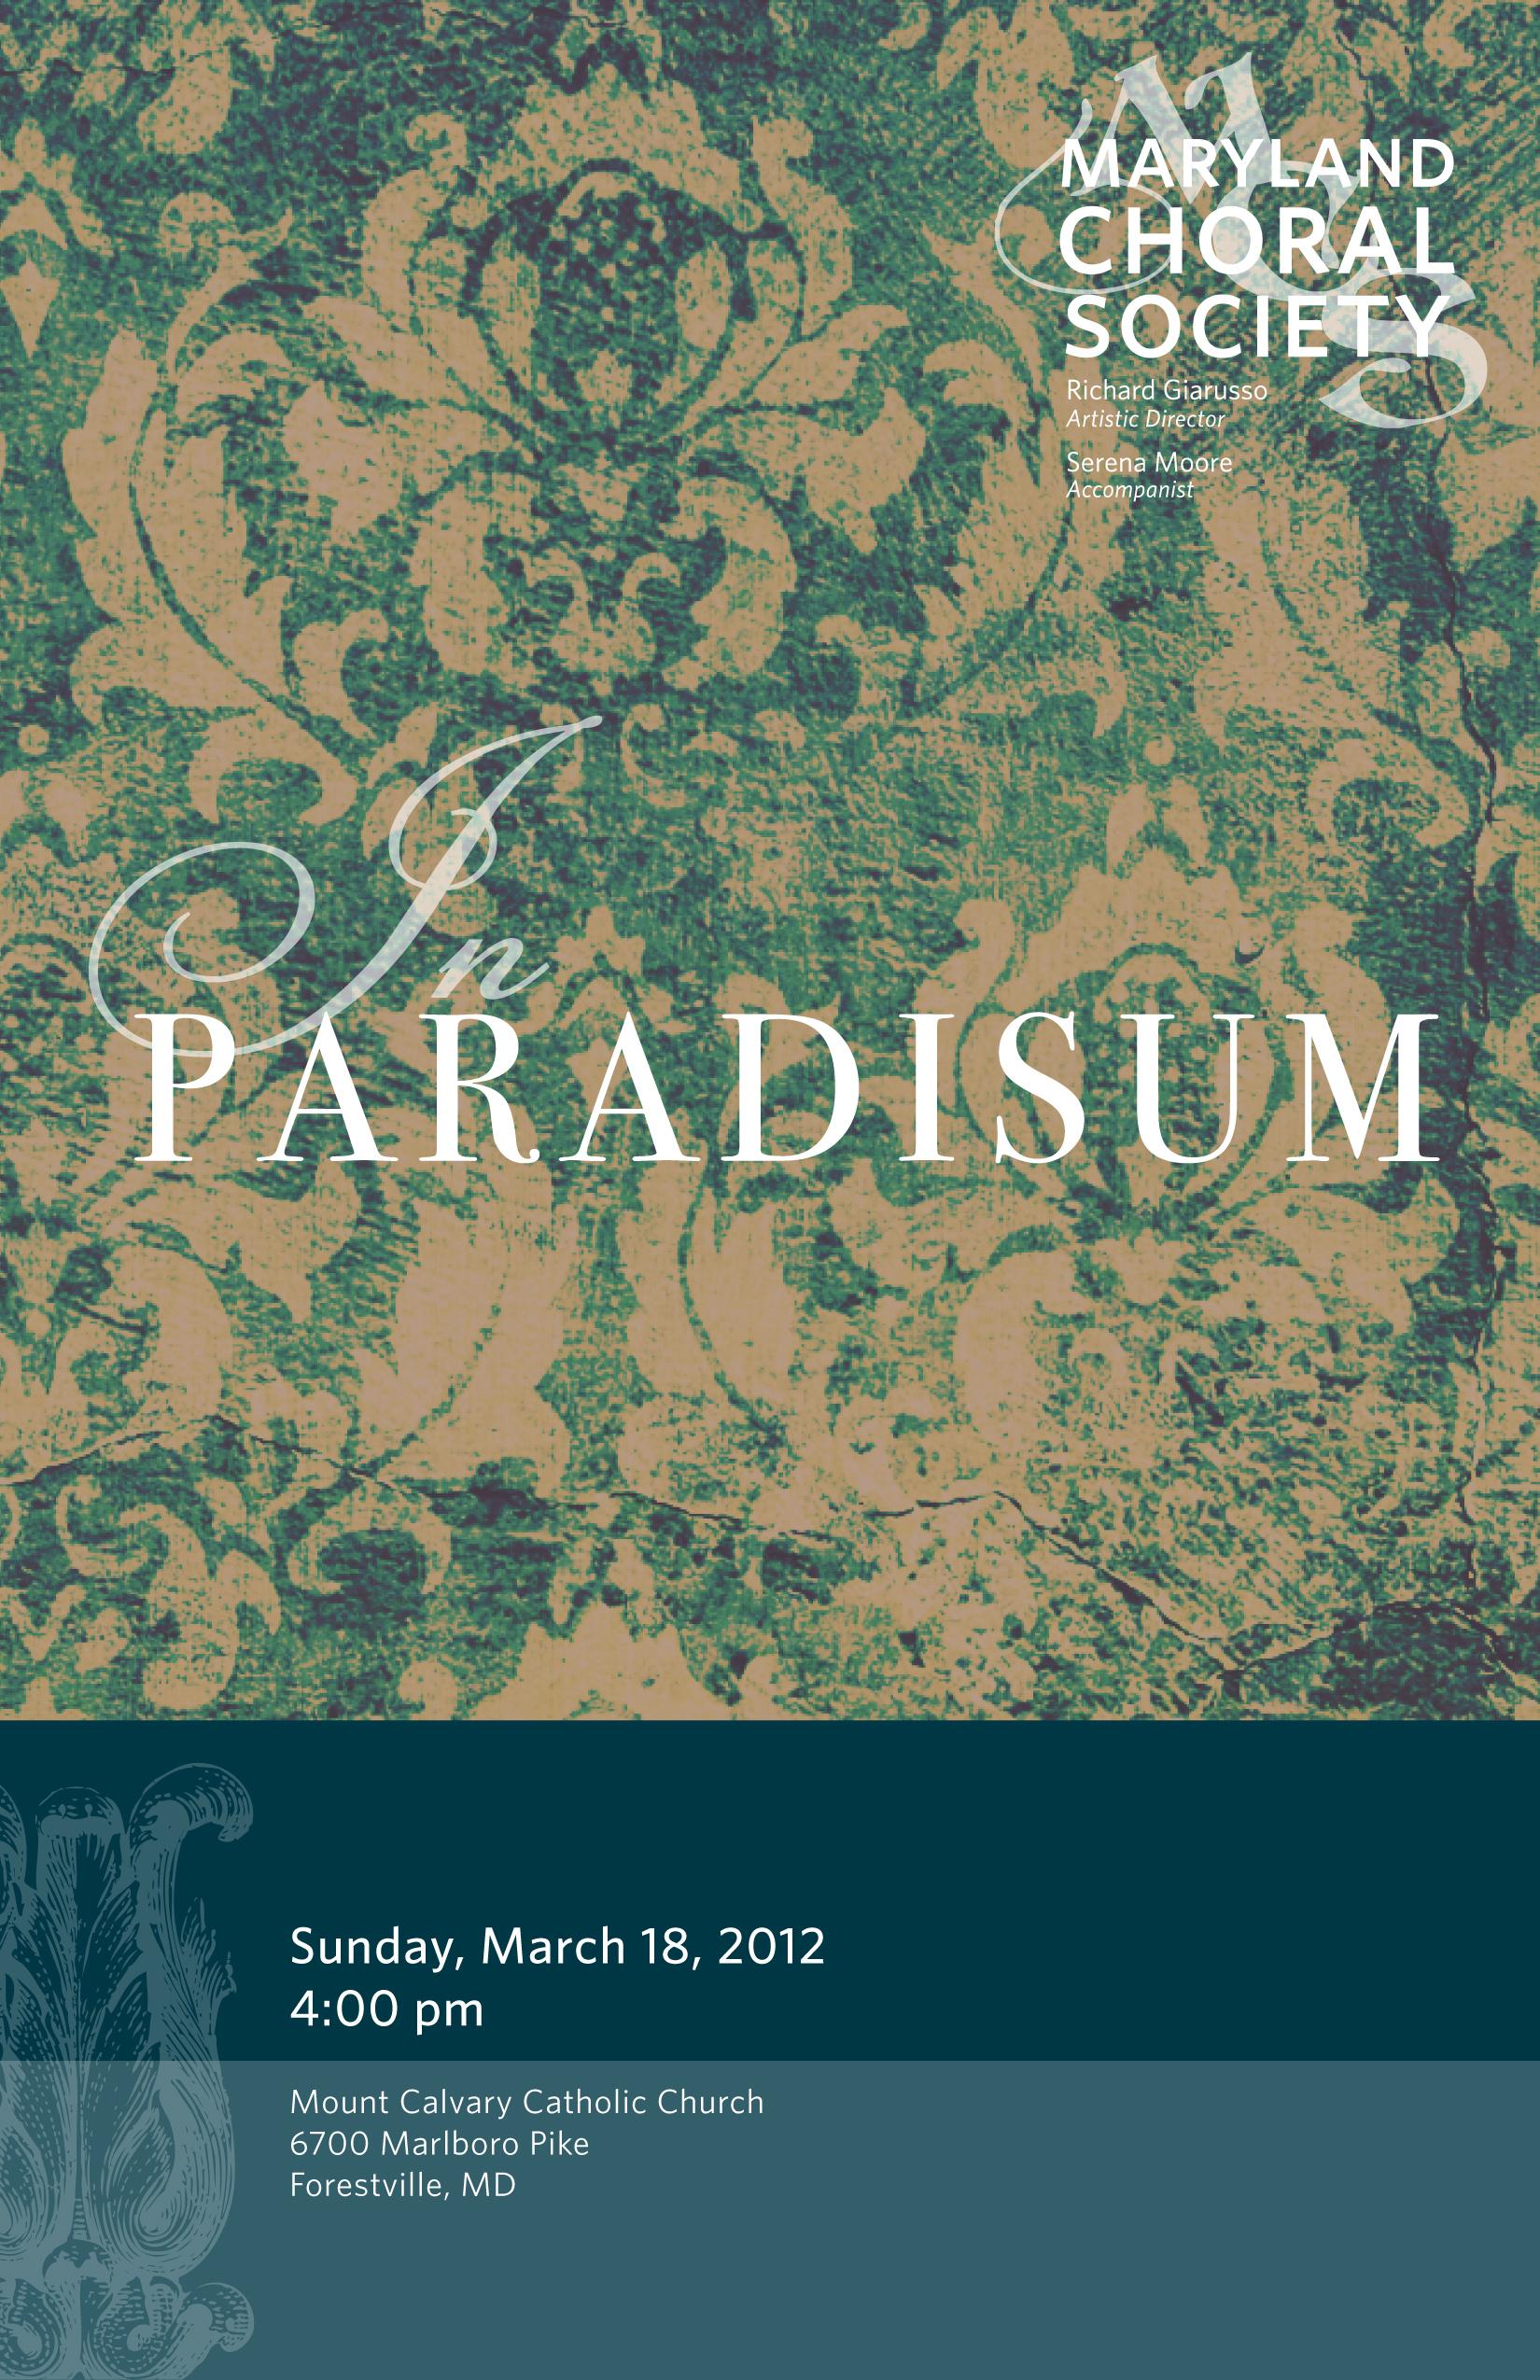 Paradisum Program Cover.jpg